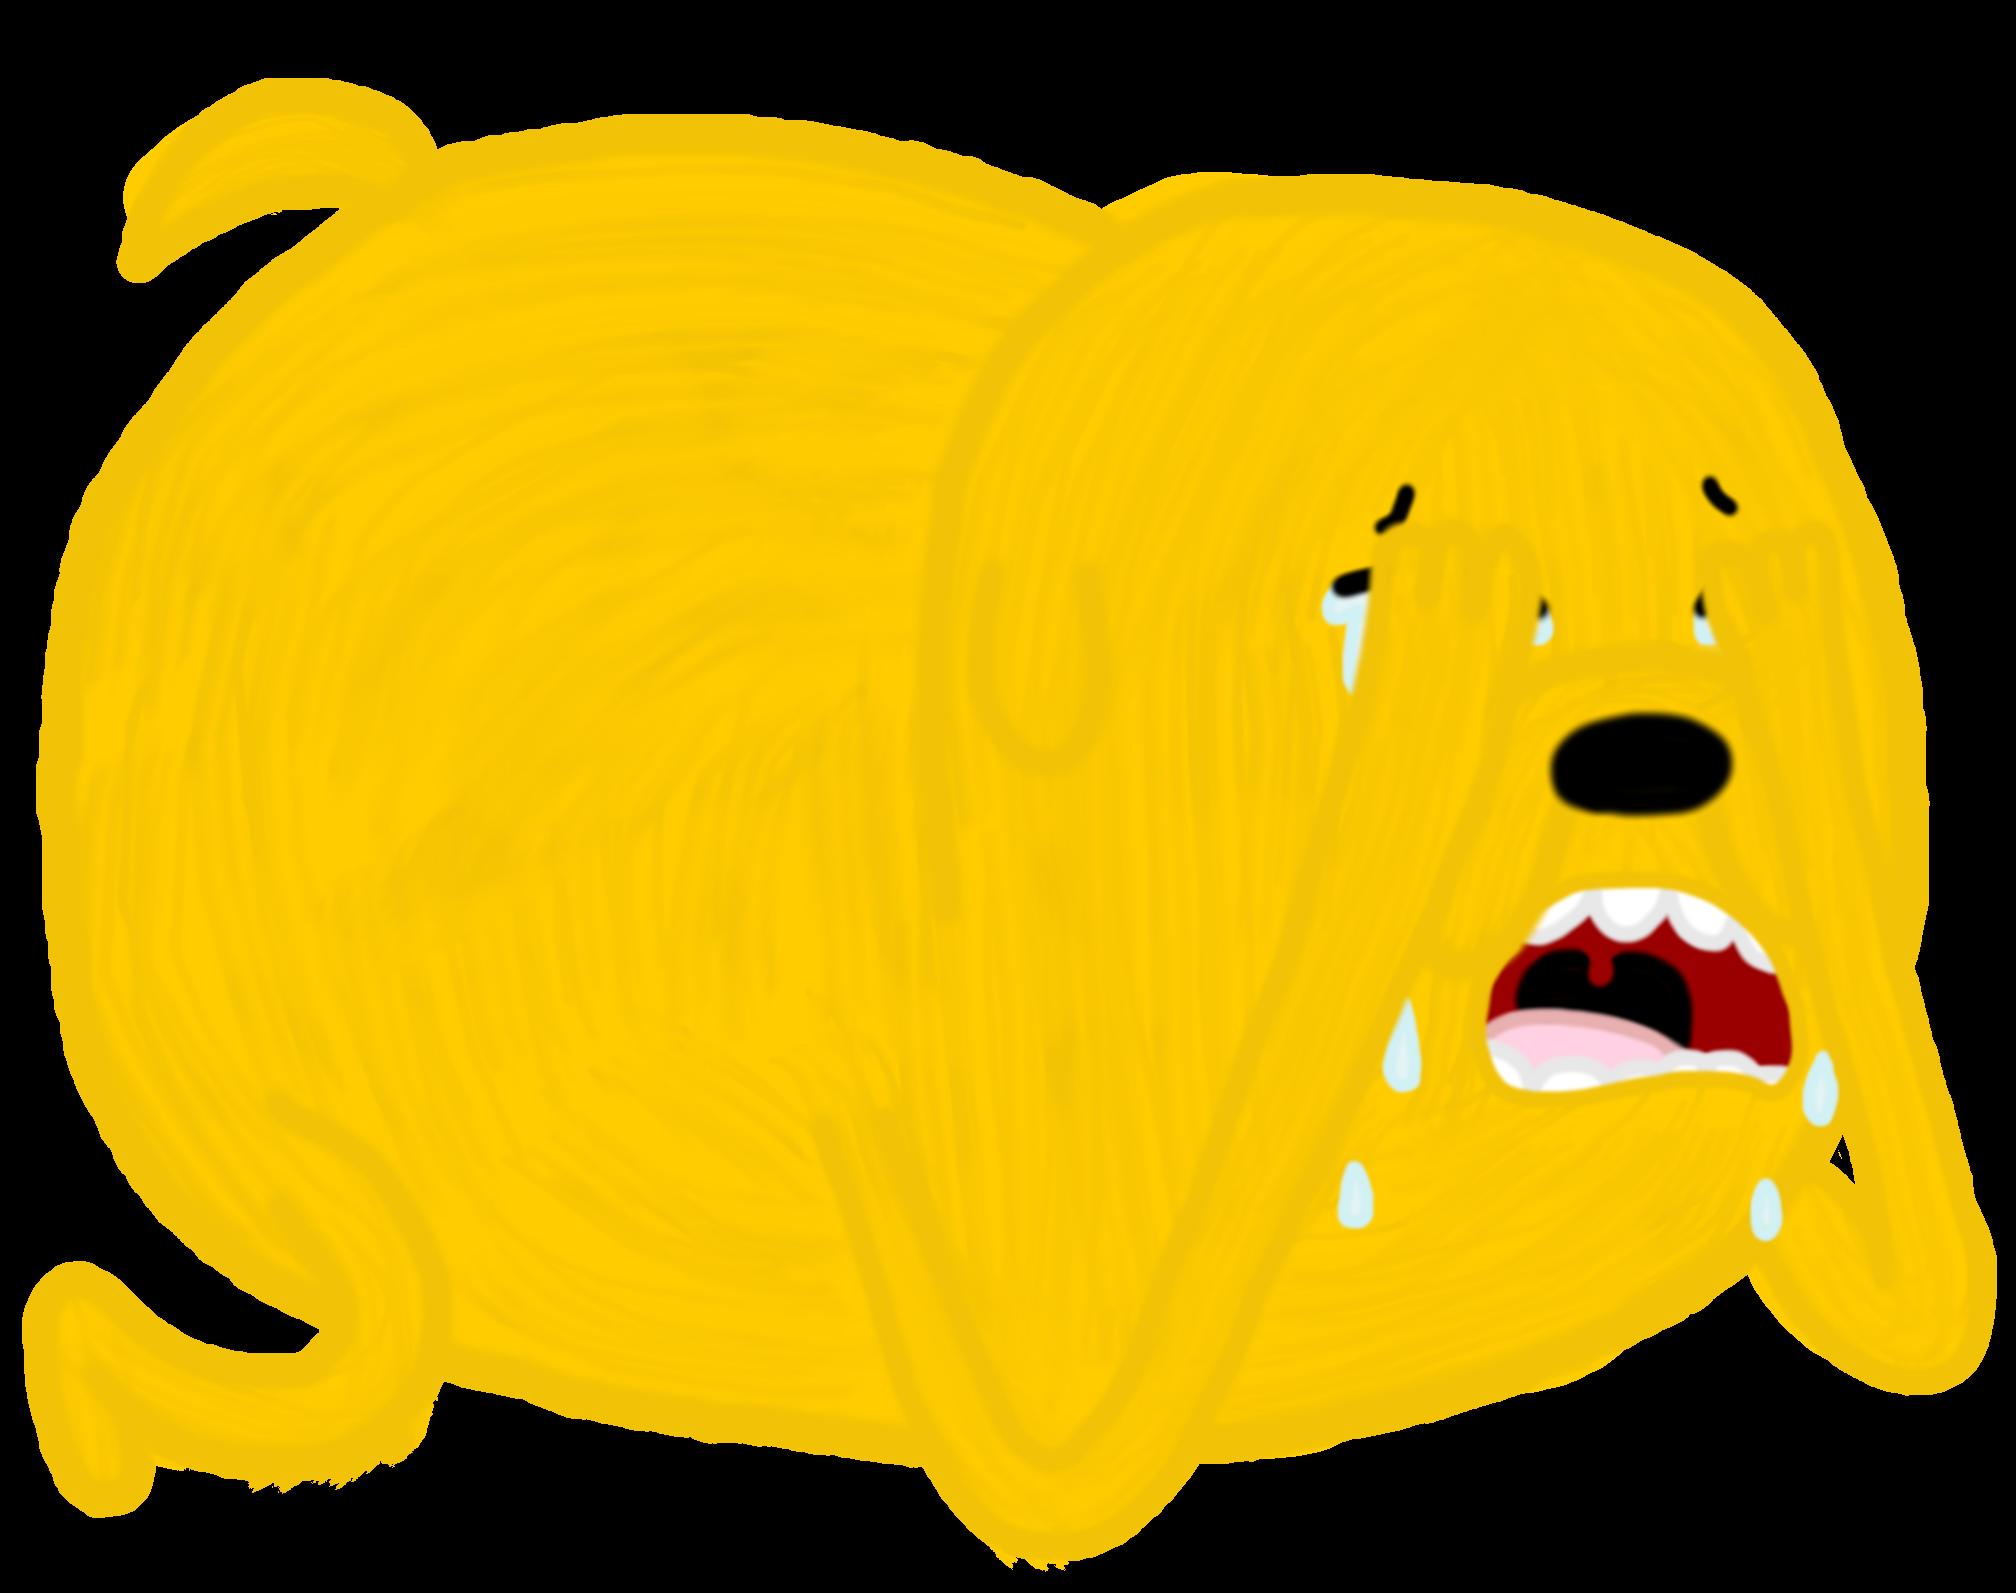 Violent crying